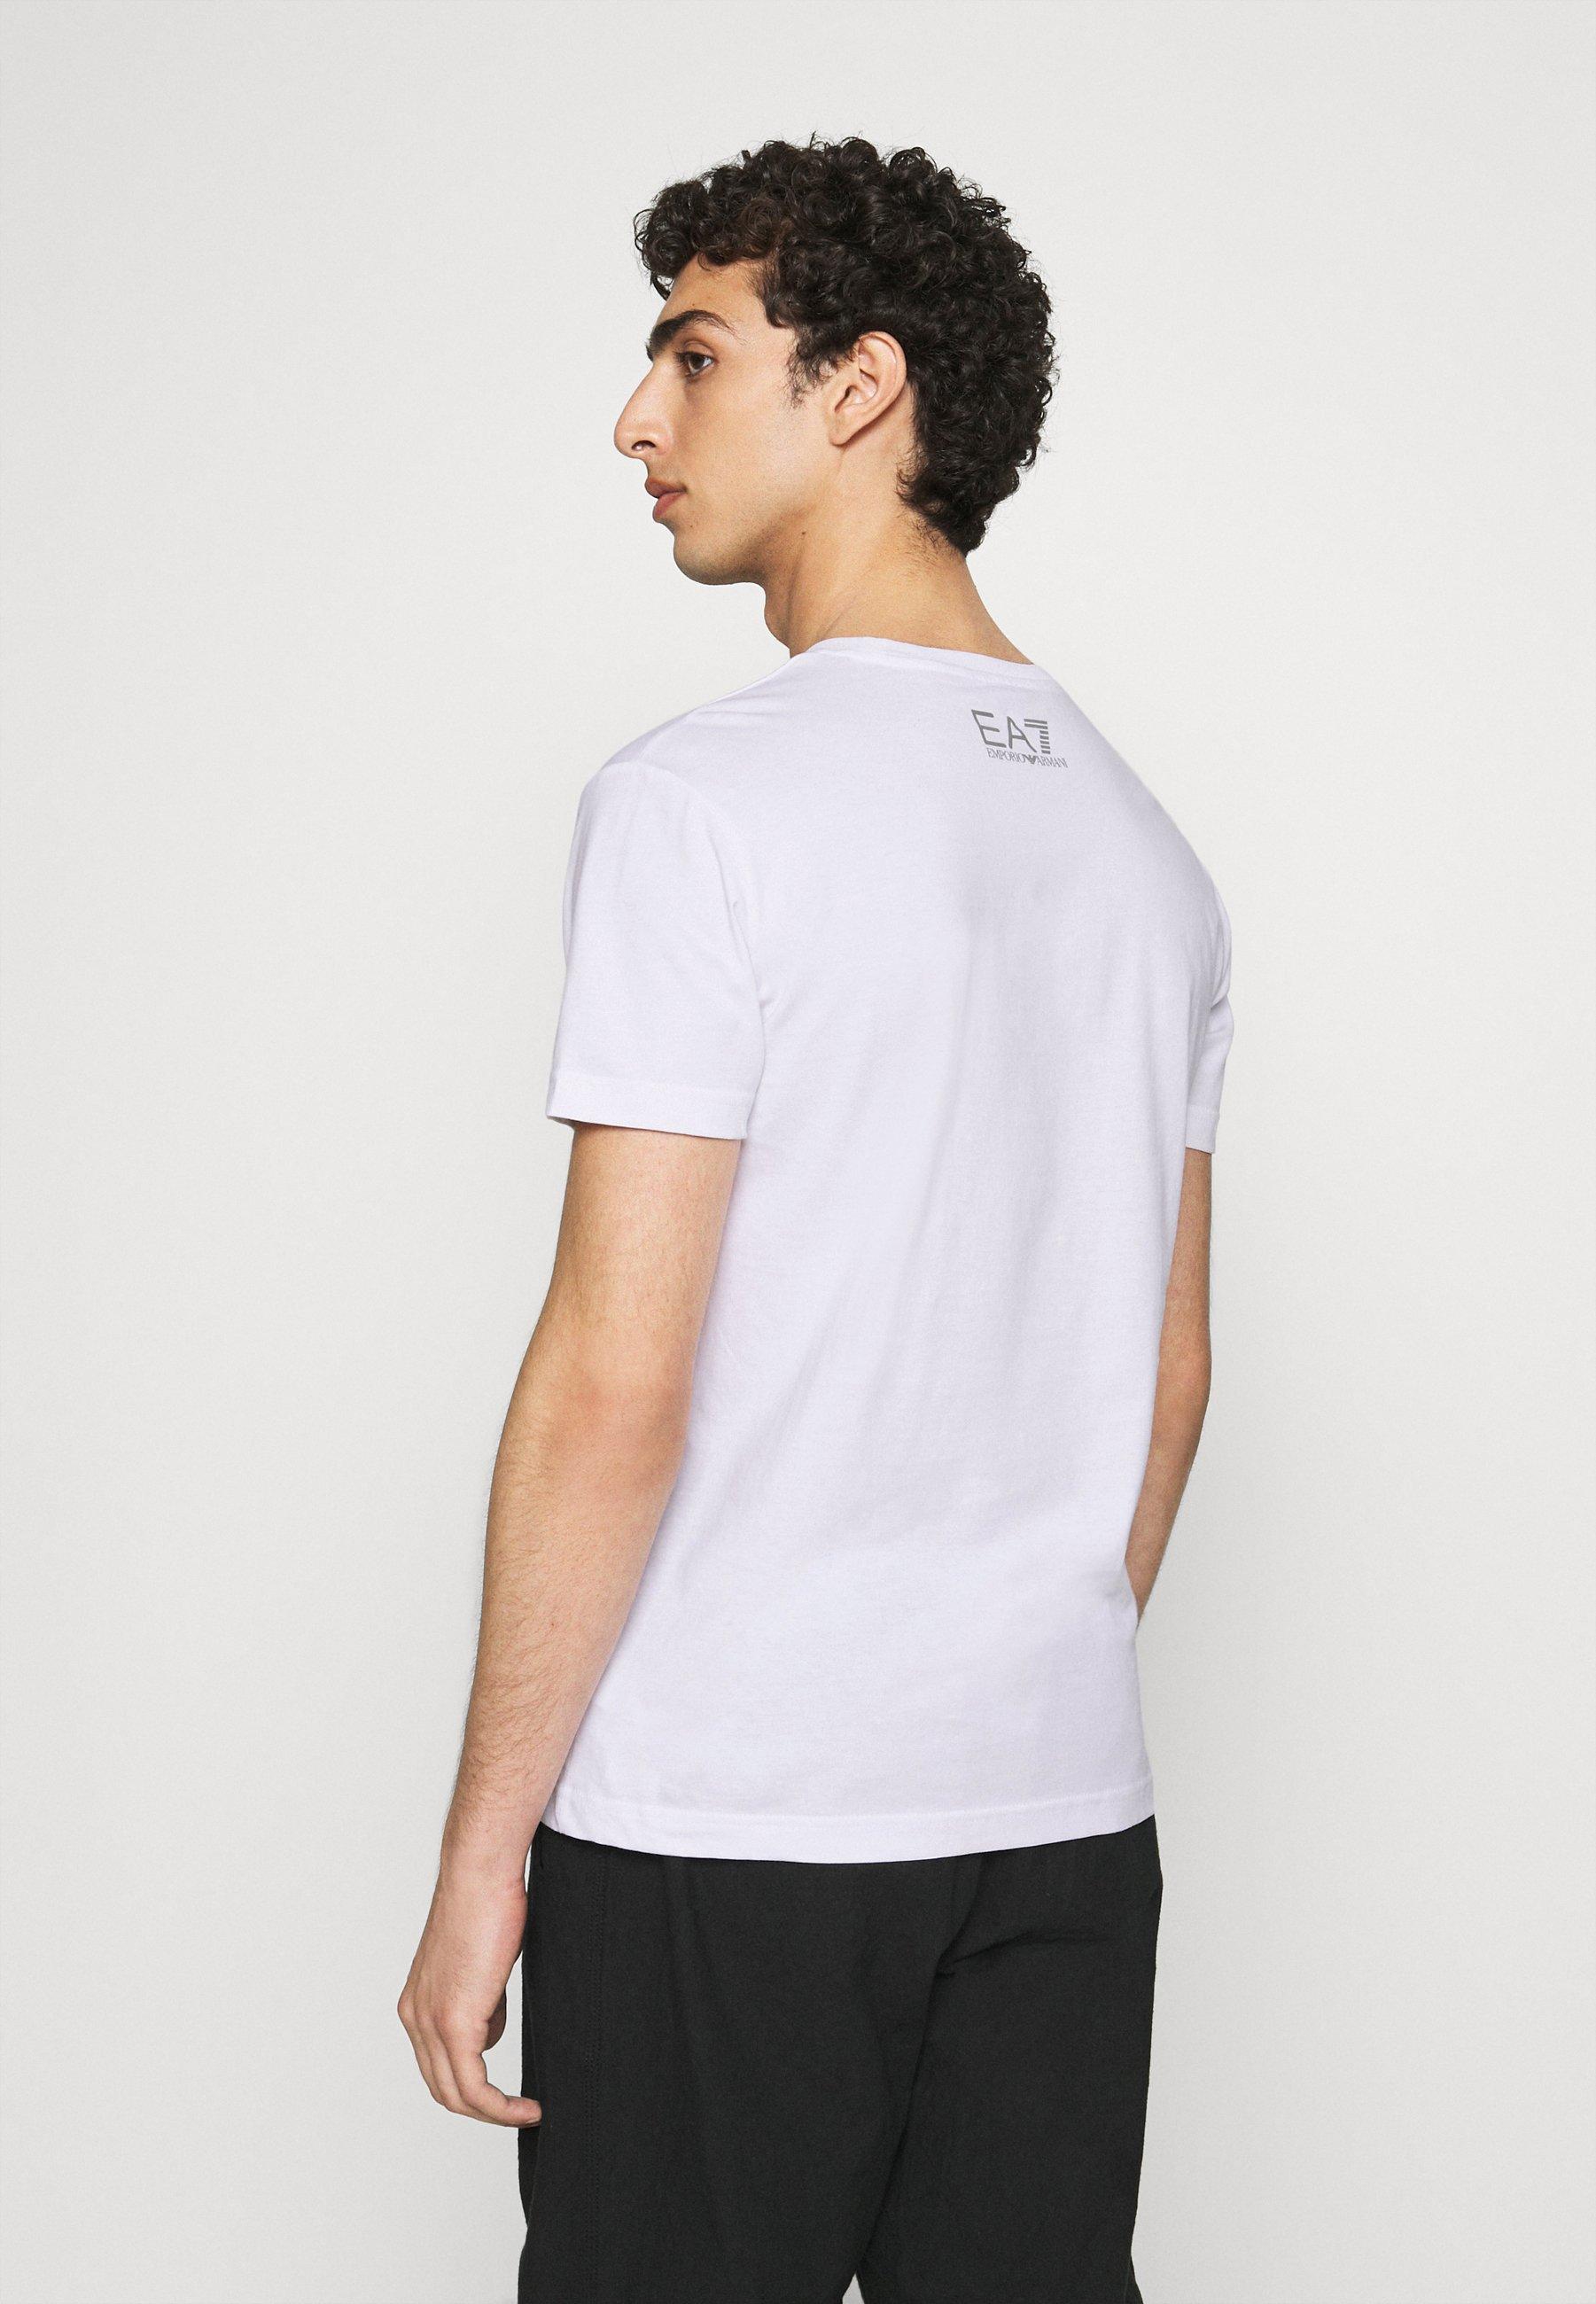 EA7 Emporio Armani Print T-shirt - white c0UKt